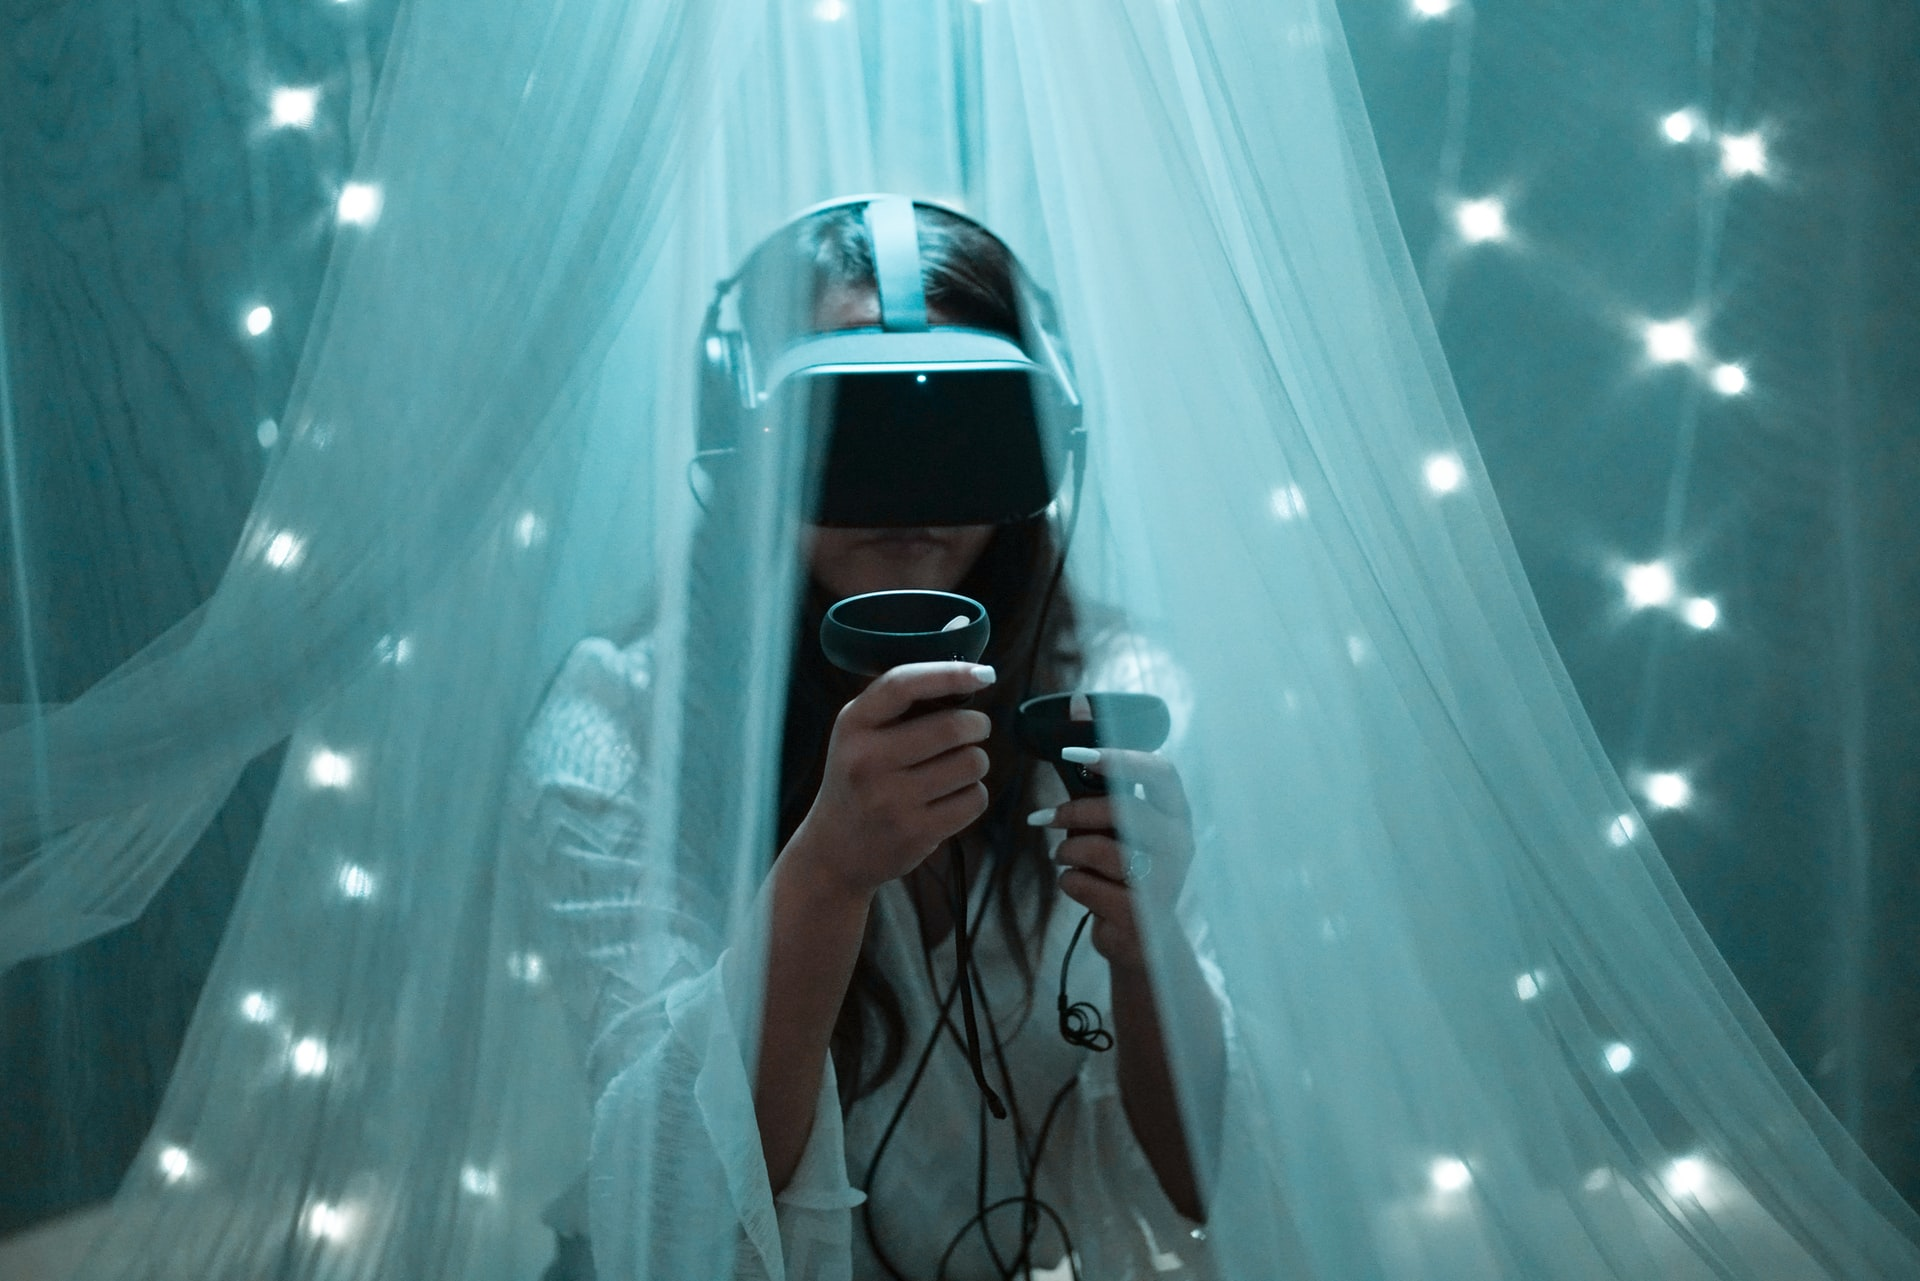 Indira Thouvenin demystifies virtual reality